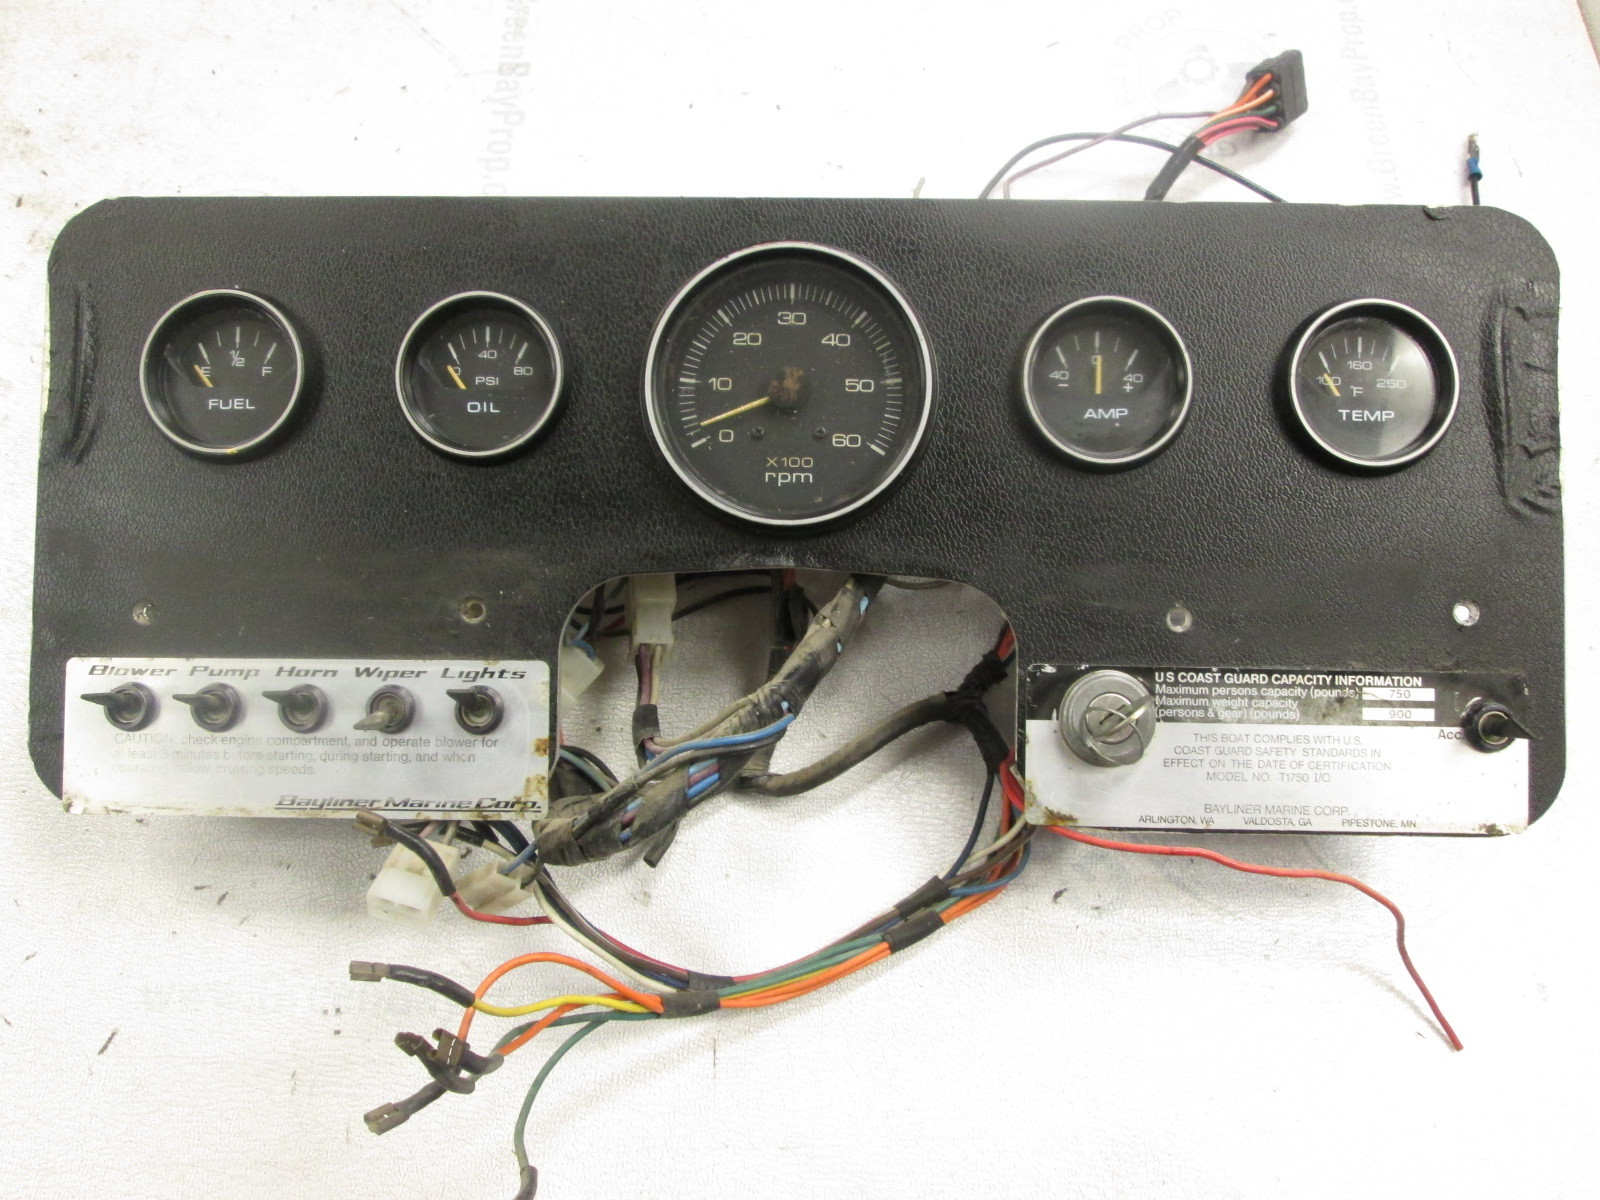 bayliner capri wiring diagram 1976 bayliner cascade dash panel with gauges and switches ... 1985 bayliner tachometer wiring